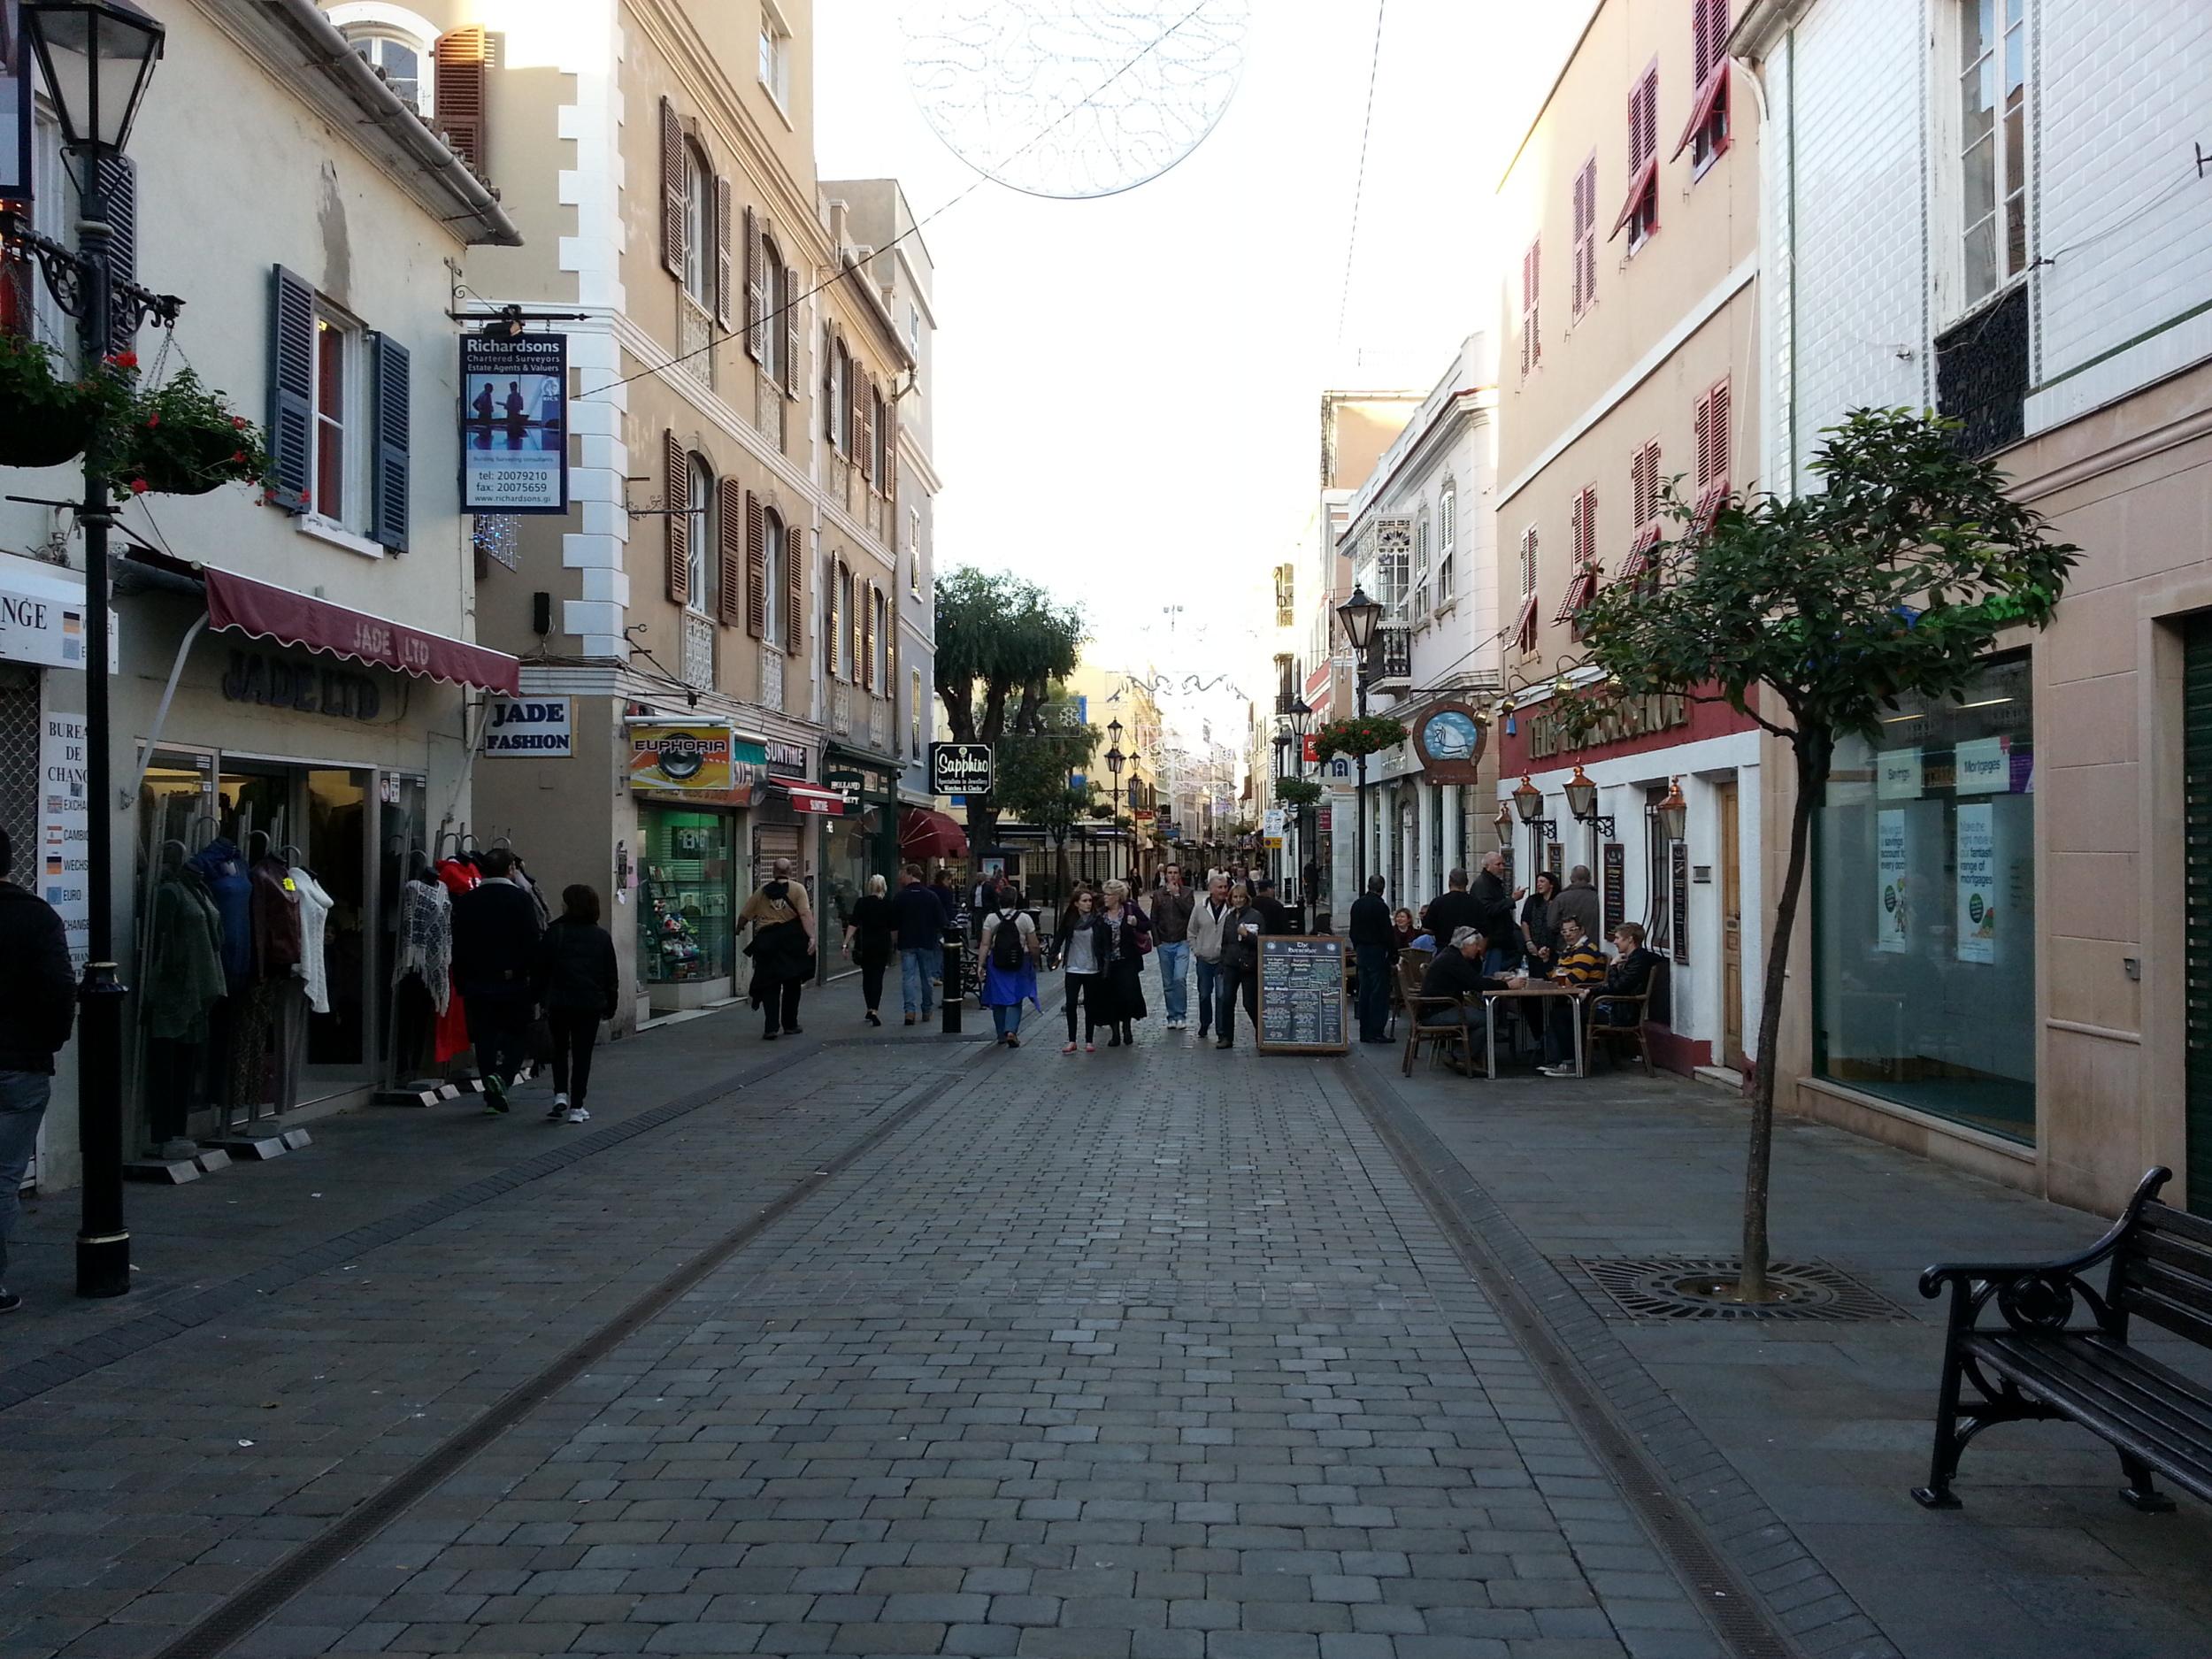 Gibraltar . Main Street. Mostly a pedestrian zone.